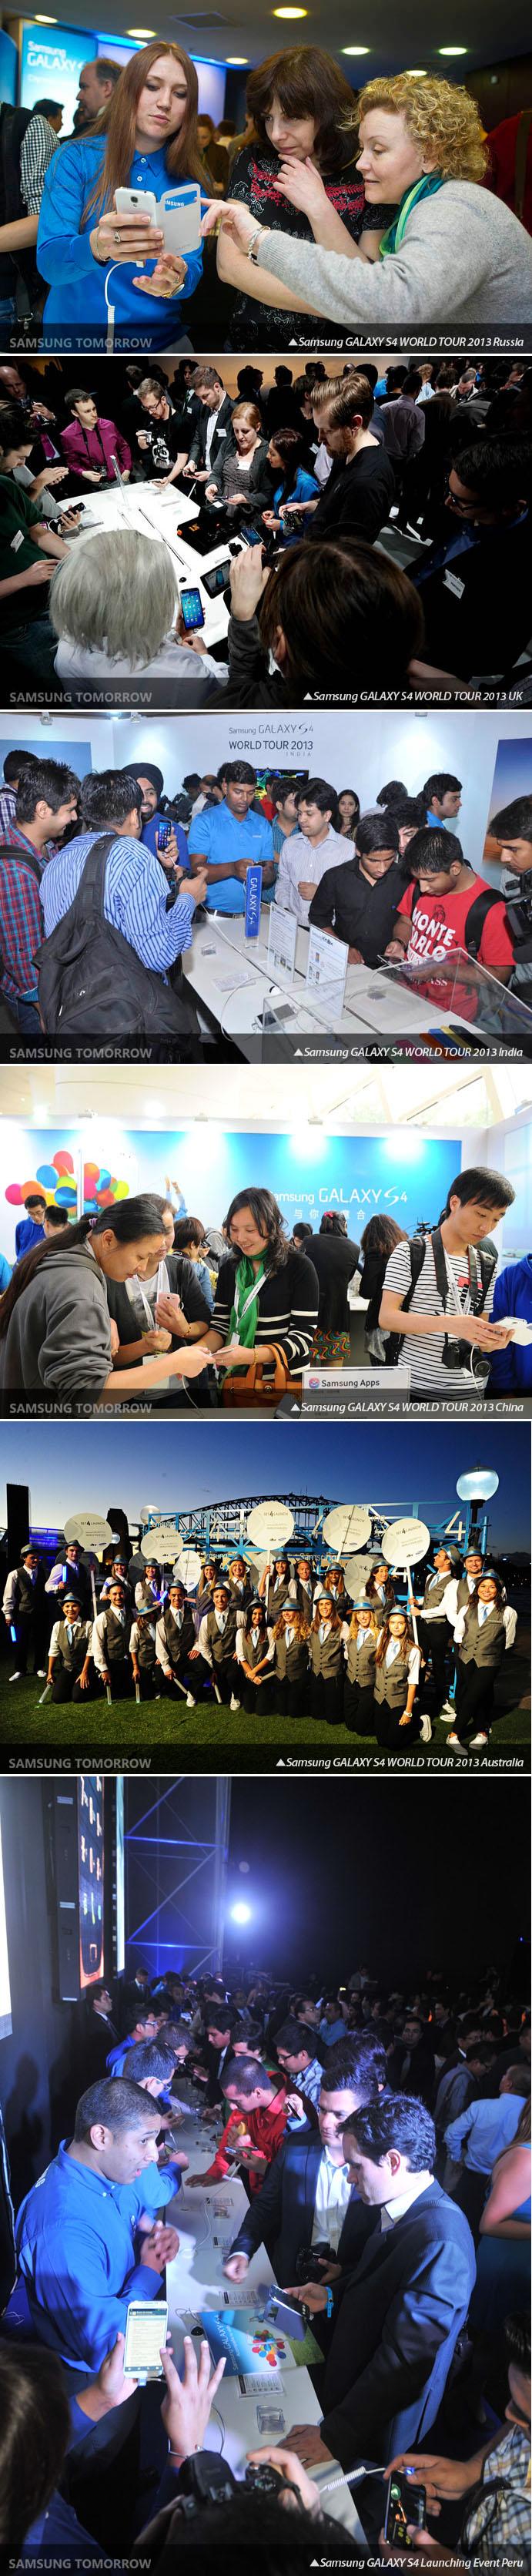 Samsung GALAXY S4 World Tour 2013